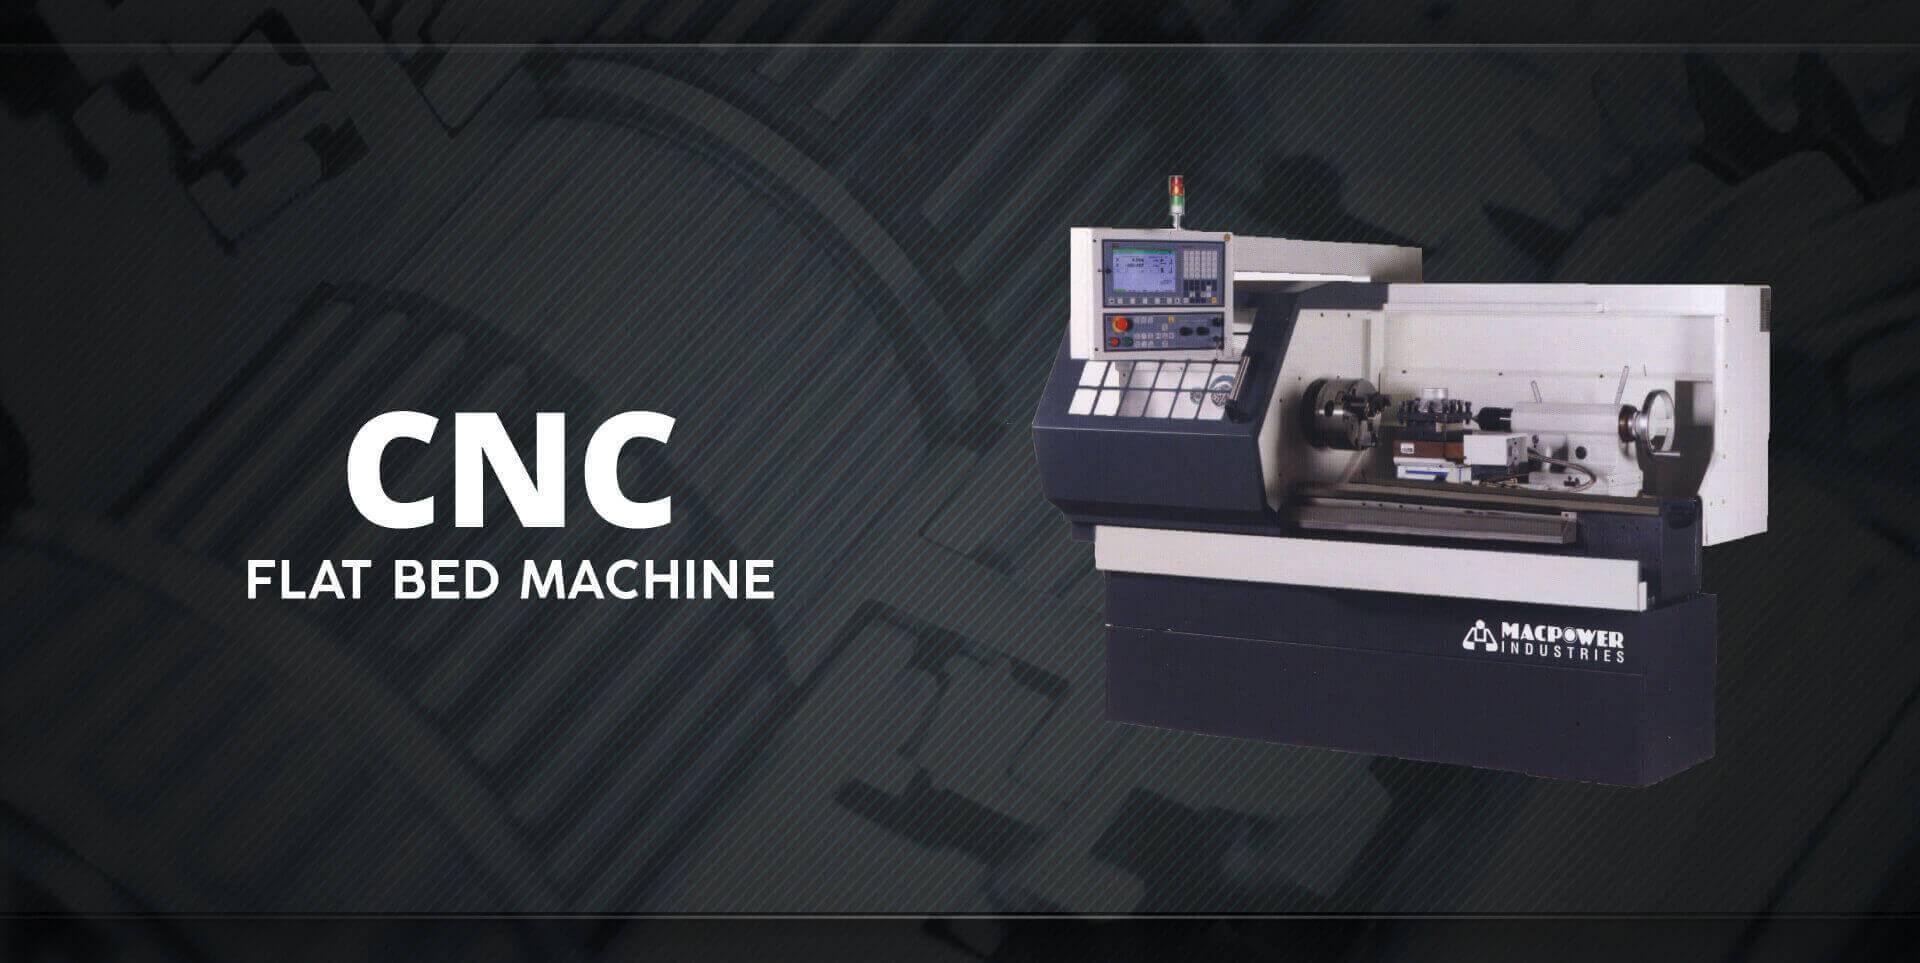 CNC Flat Bed Machine | Macpower Industries